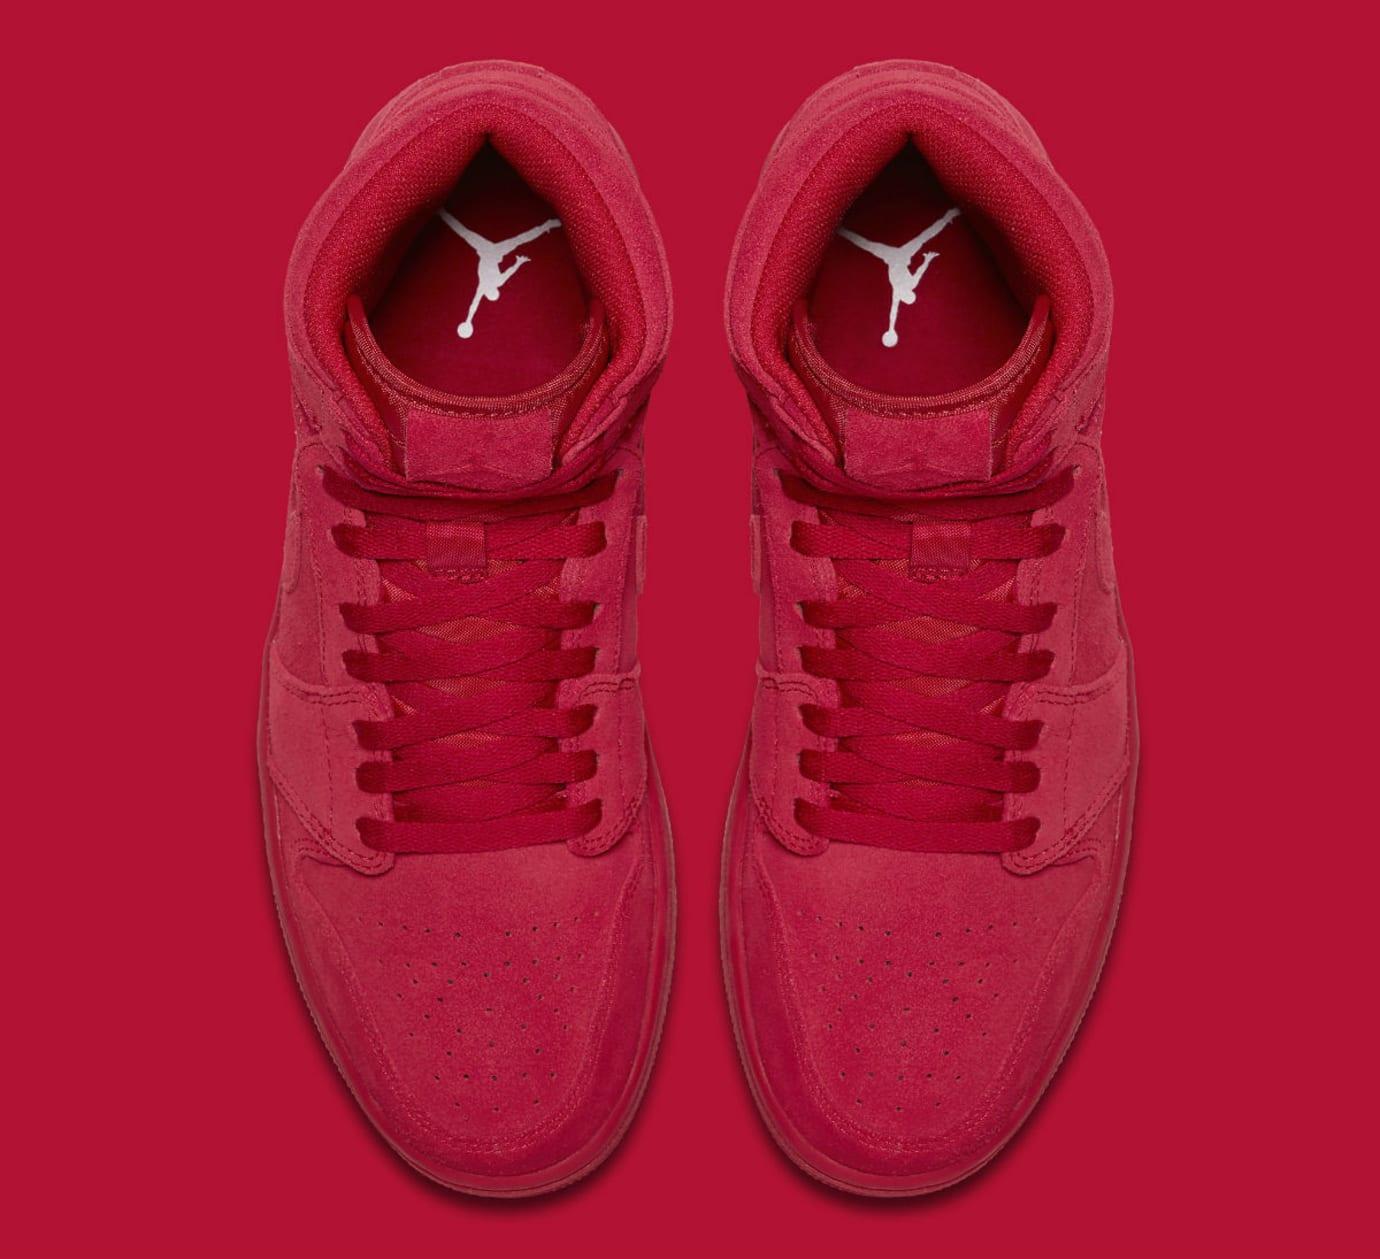 fe2dcf9dcb8c Air Jordan 1 High Red Suede Release Date Top 332550-603